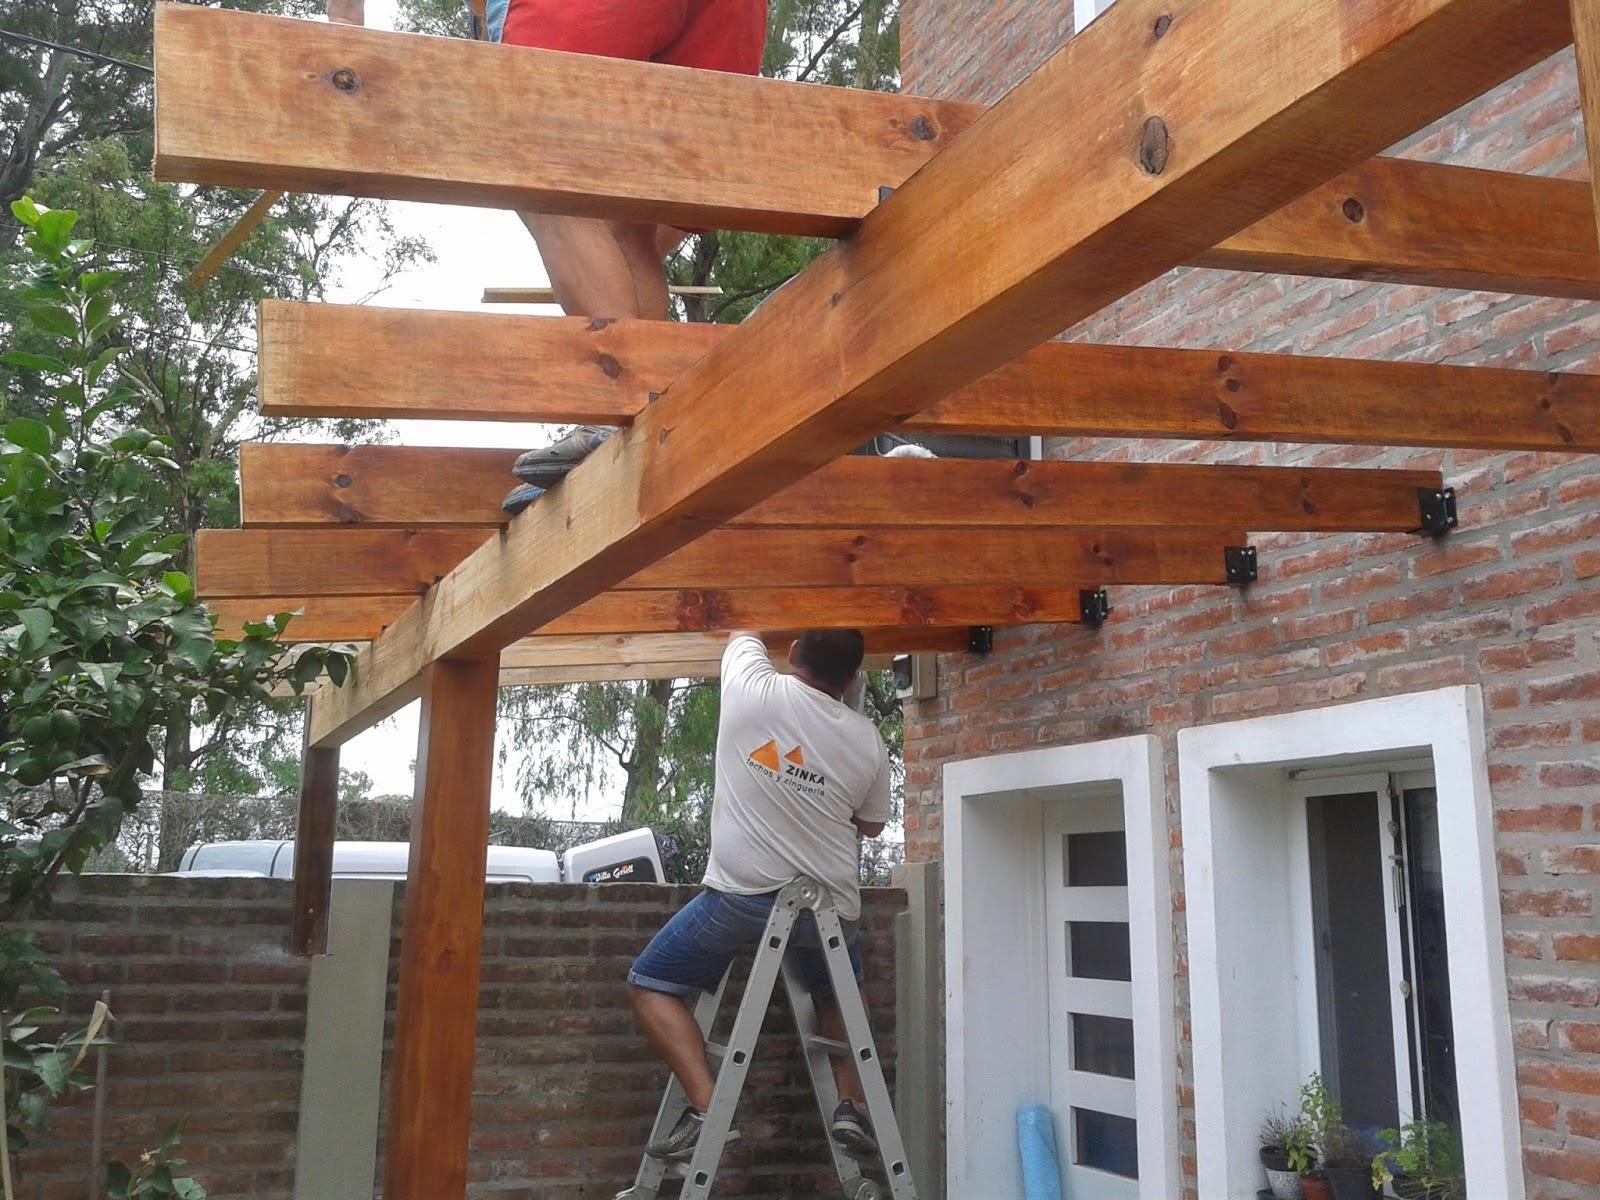 Zinka techos pergolas de madera y metalicas - Pergola de madera ...